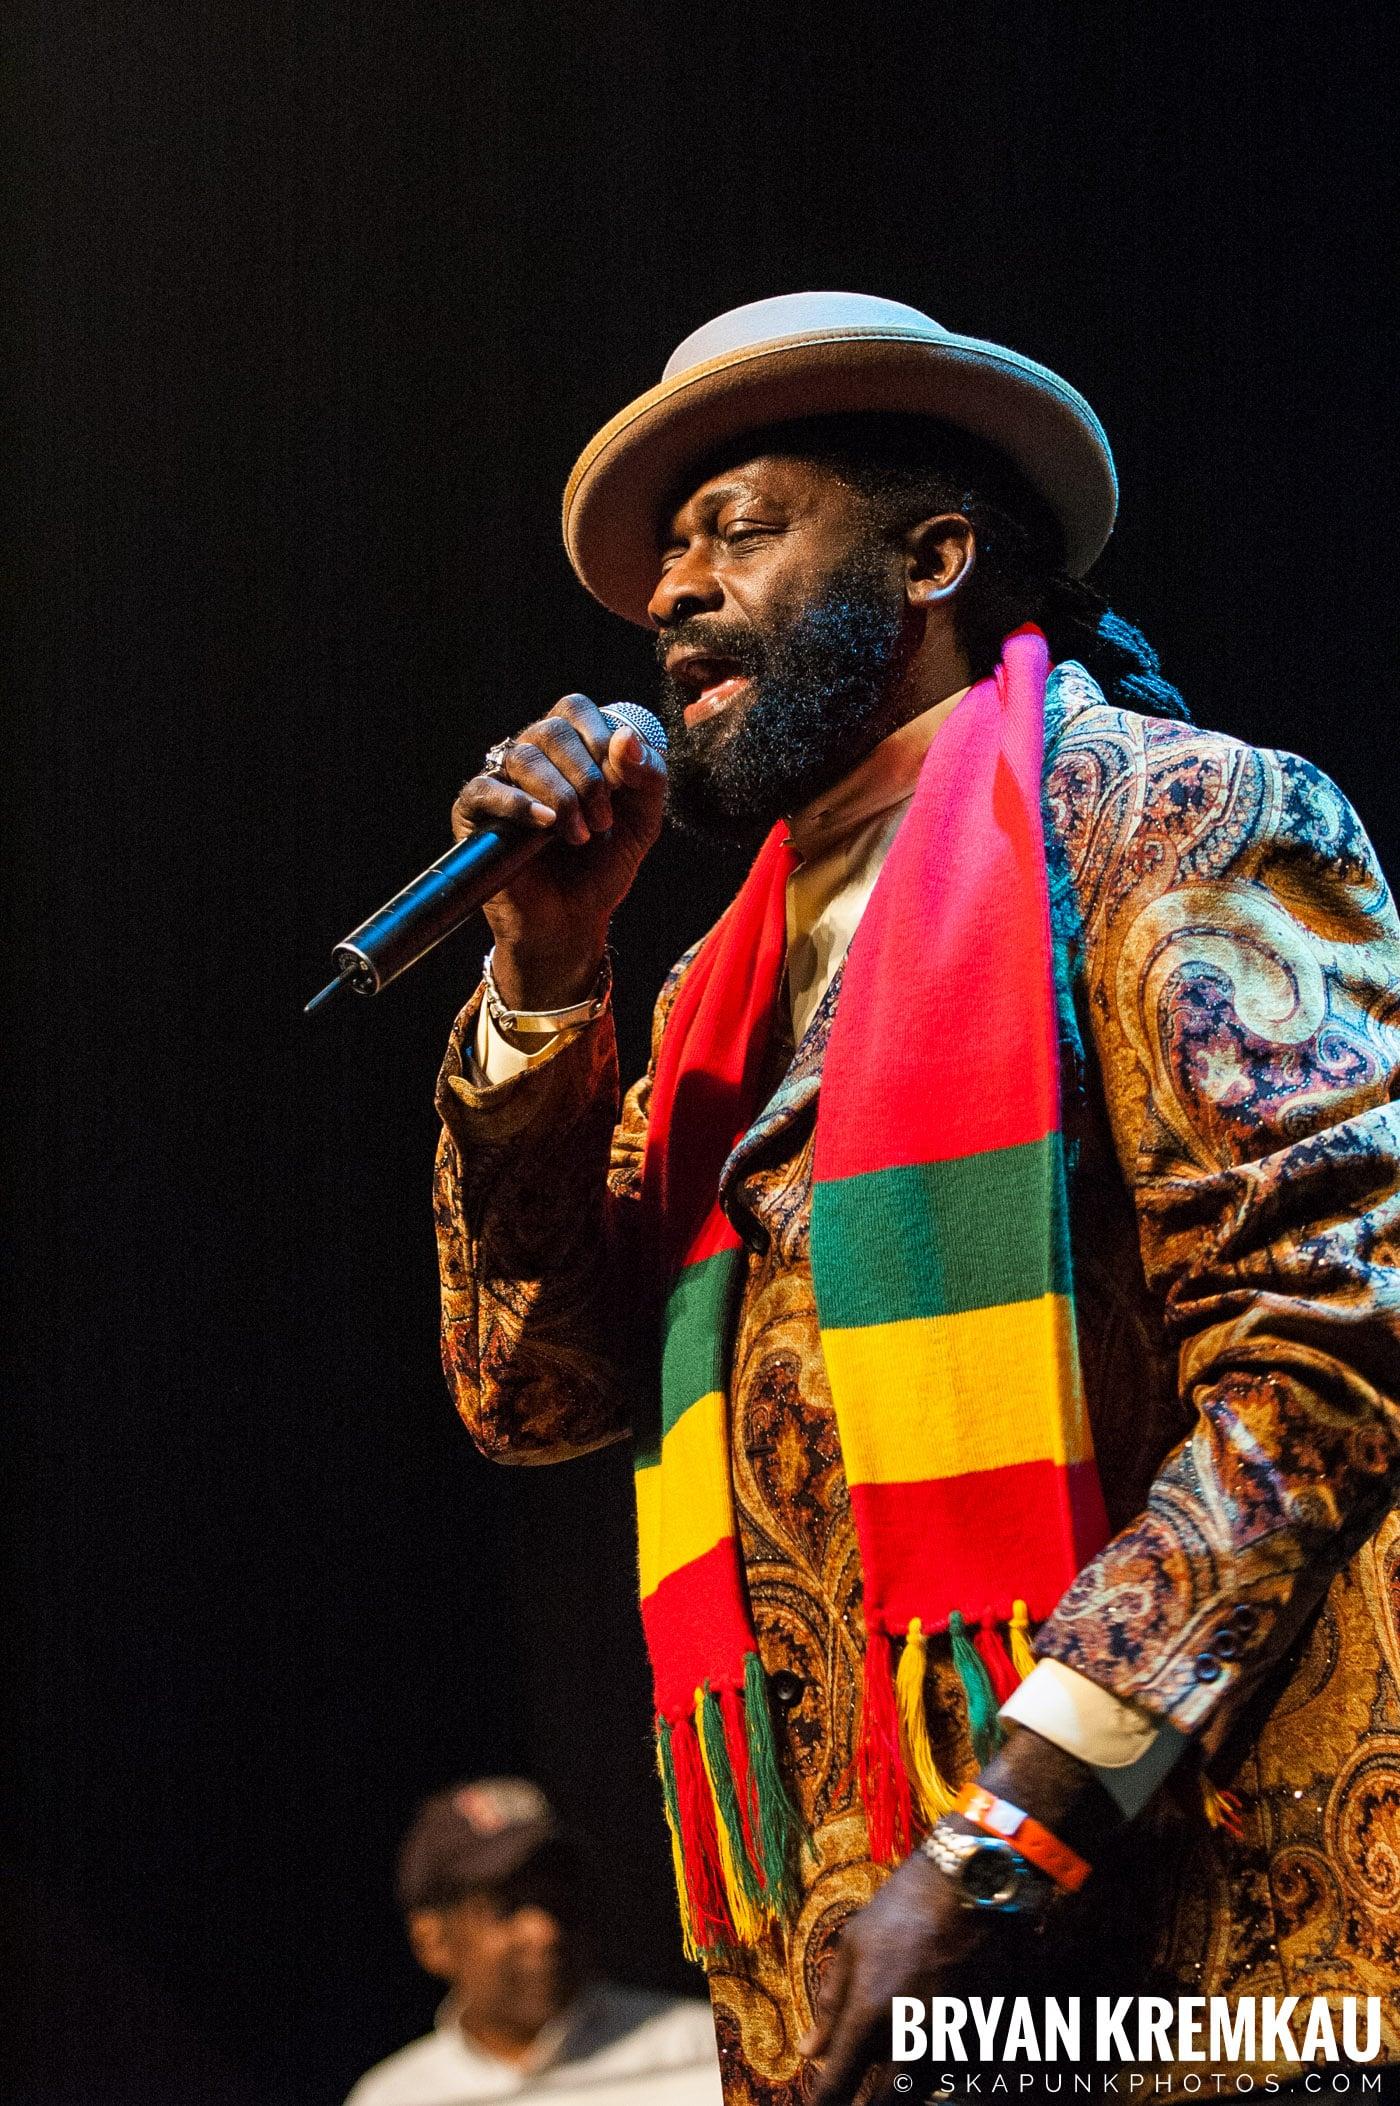 Jimmy Riley @ Vintage Reggae Fest - Hammerstein Ballroom, NYC - 12.16.07 (6)